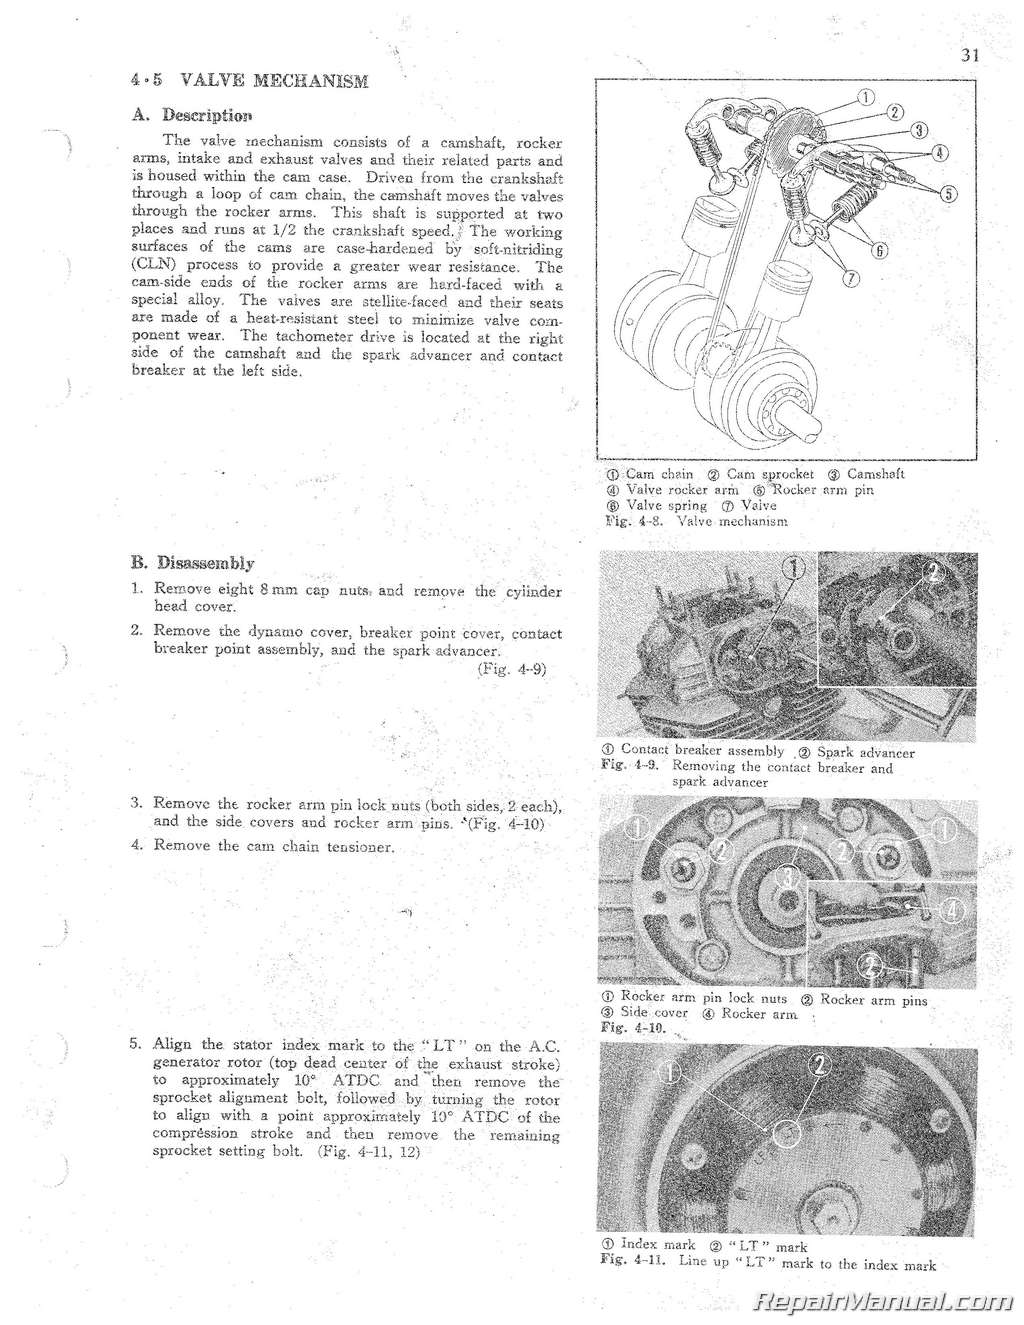 1968 1973 honda cb cl 250 cb cl sl350 motorcycle shop manualHonda Motorcycle Parts 1968 Cb350k4 A Camshaft Valve Diagram #21